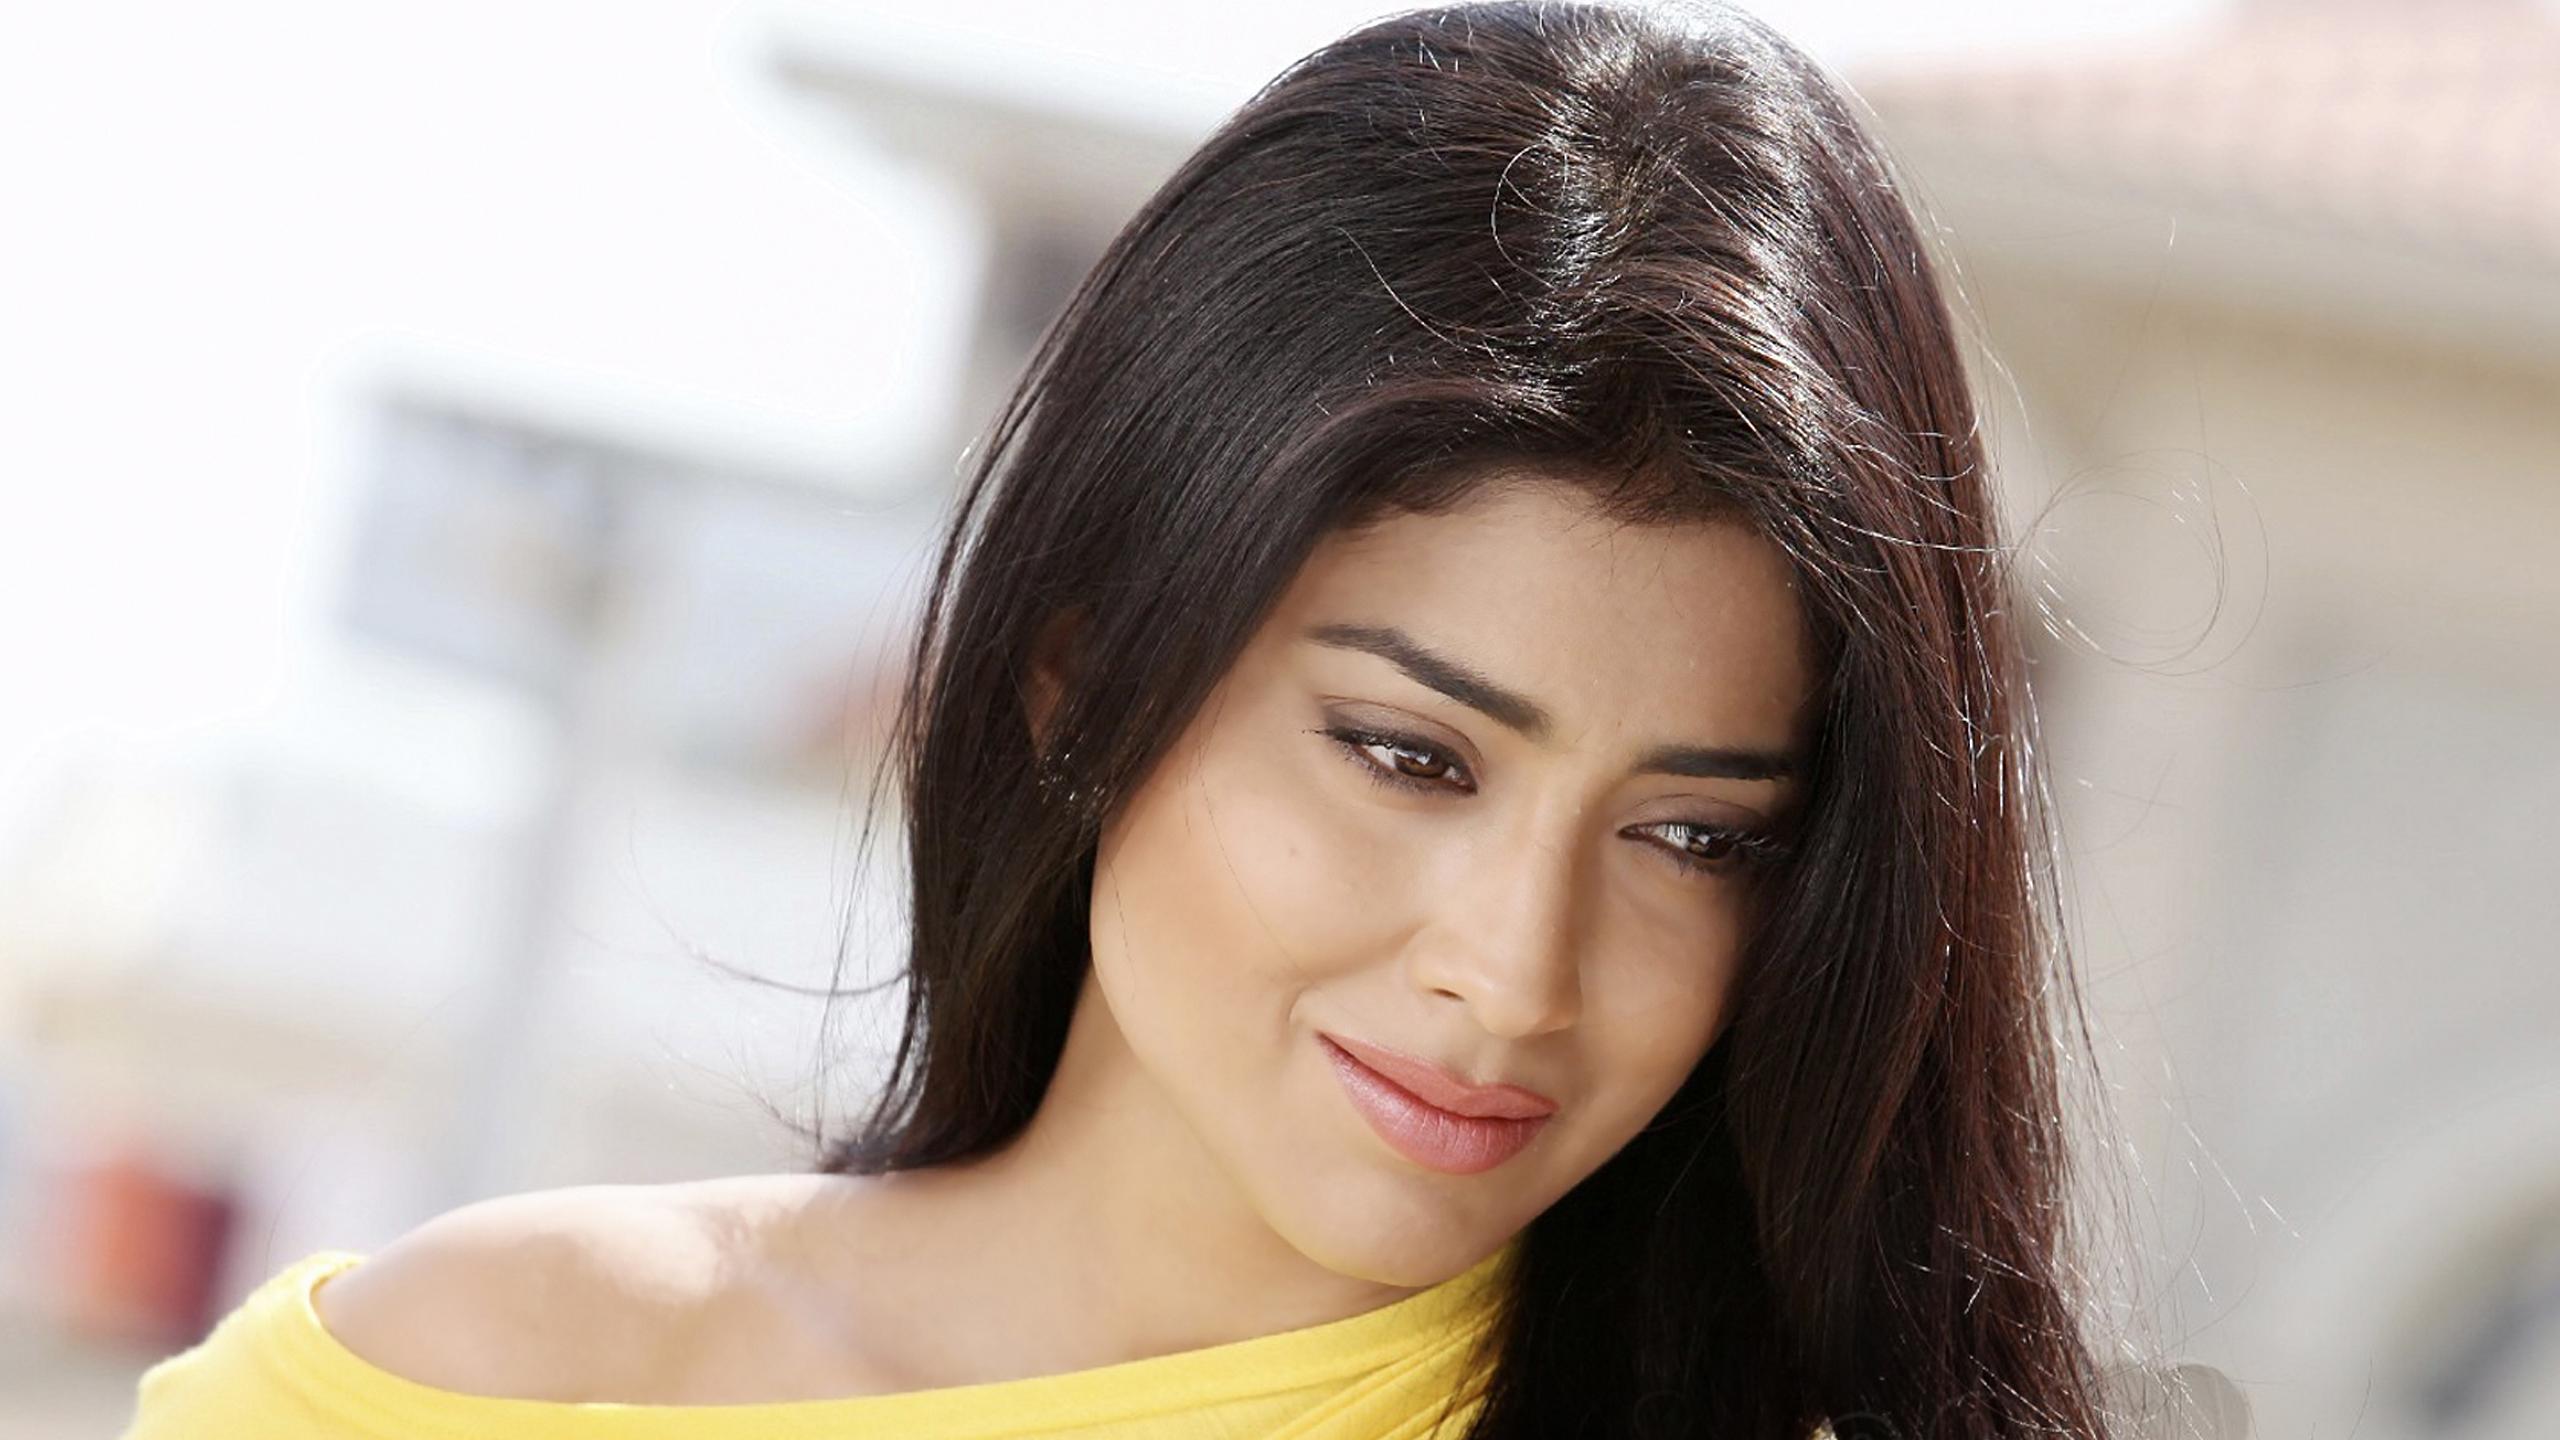 Shriya saran indian telugu cinema actress sexy cute hot wallpaper 2560x1440 83466 wallpaperup - Simple girls photo for facebook ...